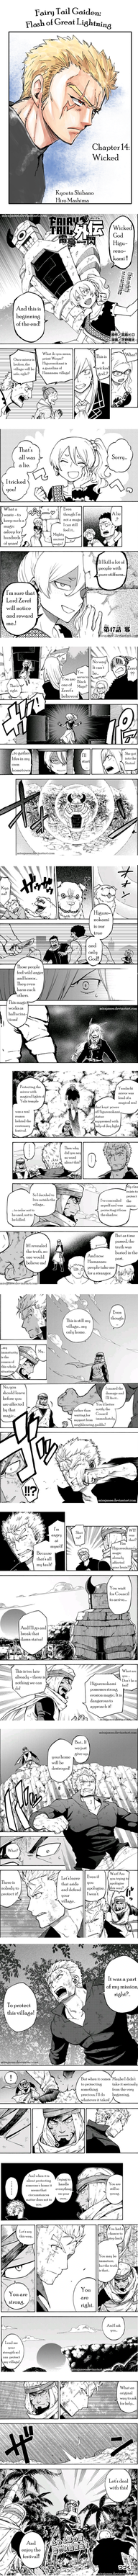 Fairy Tail Gaiden: Flash of Great Lightning 14 by Mirajanee